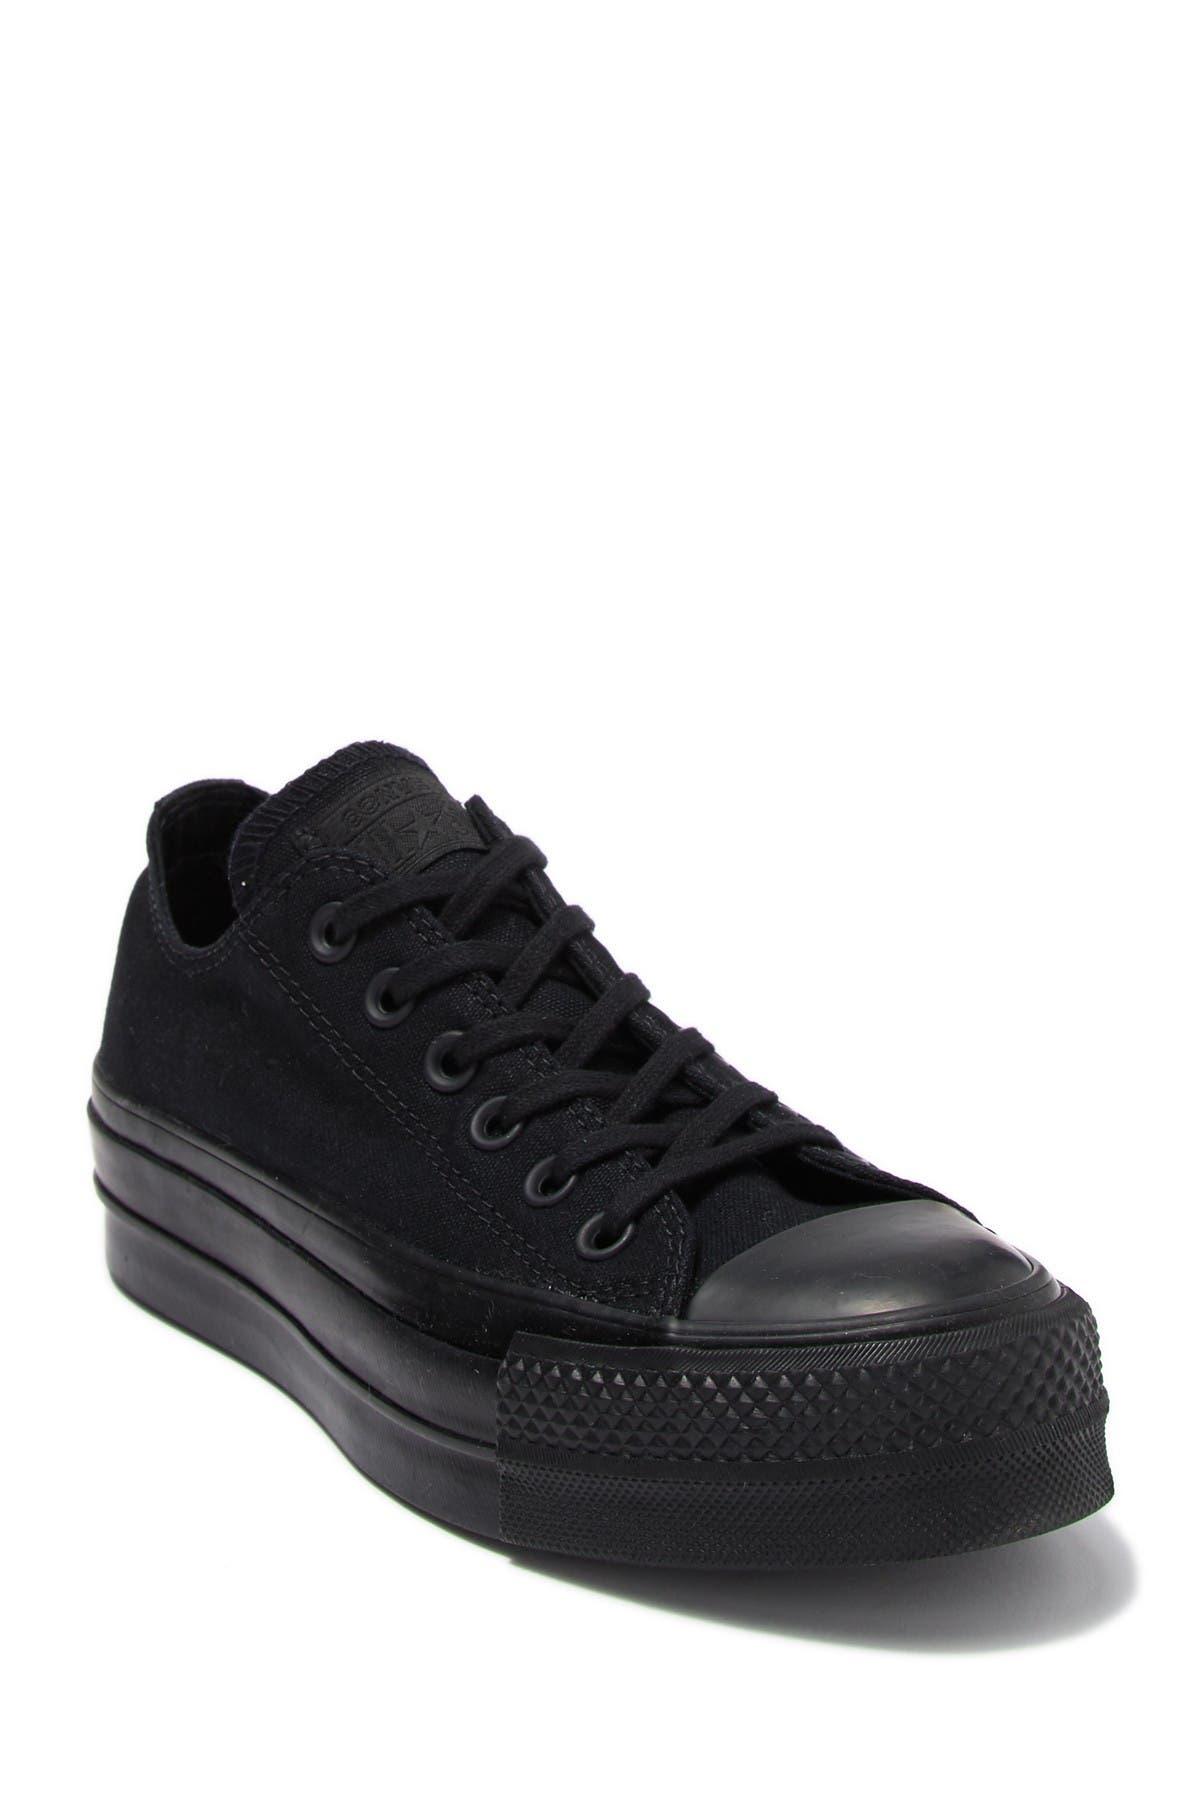 converse lift black